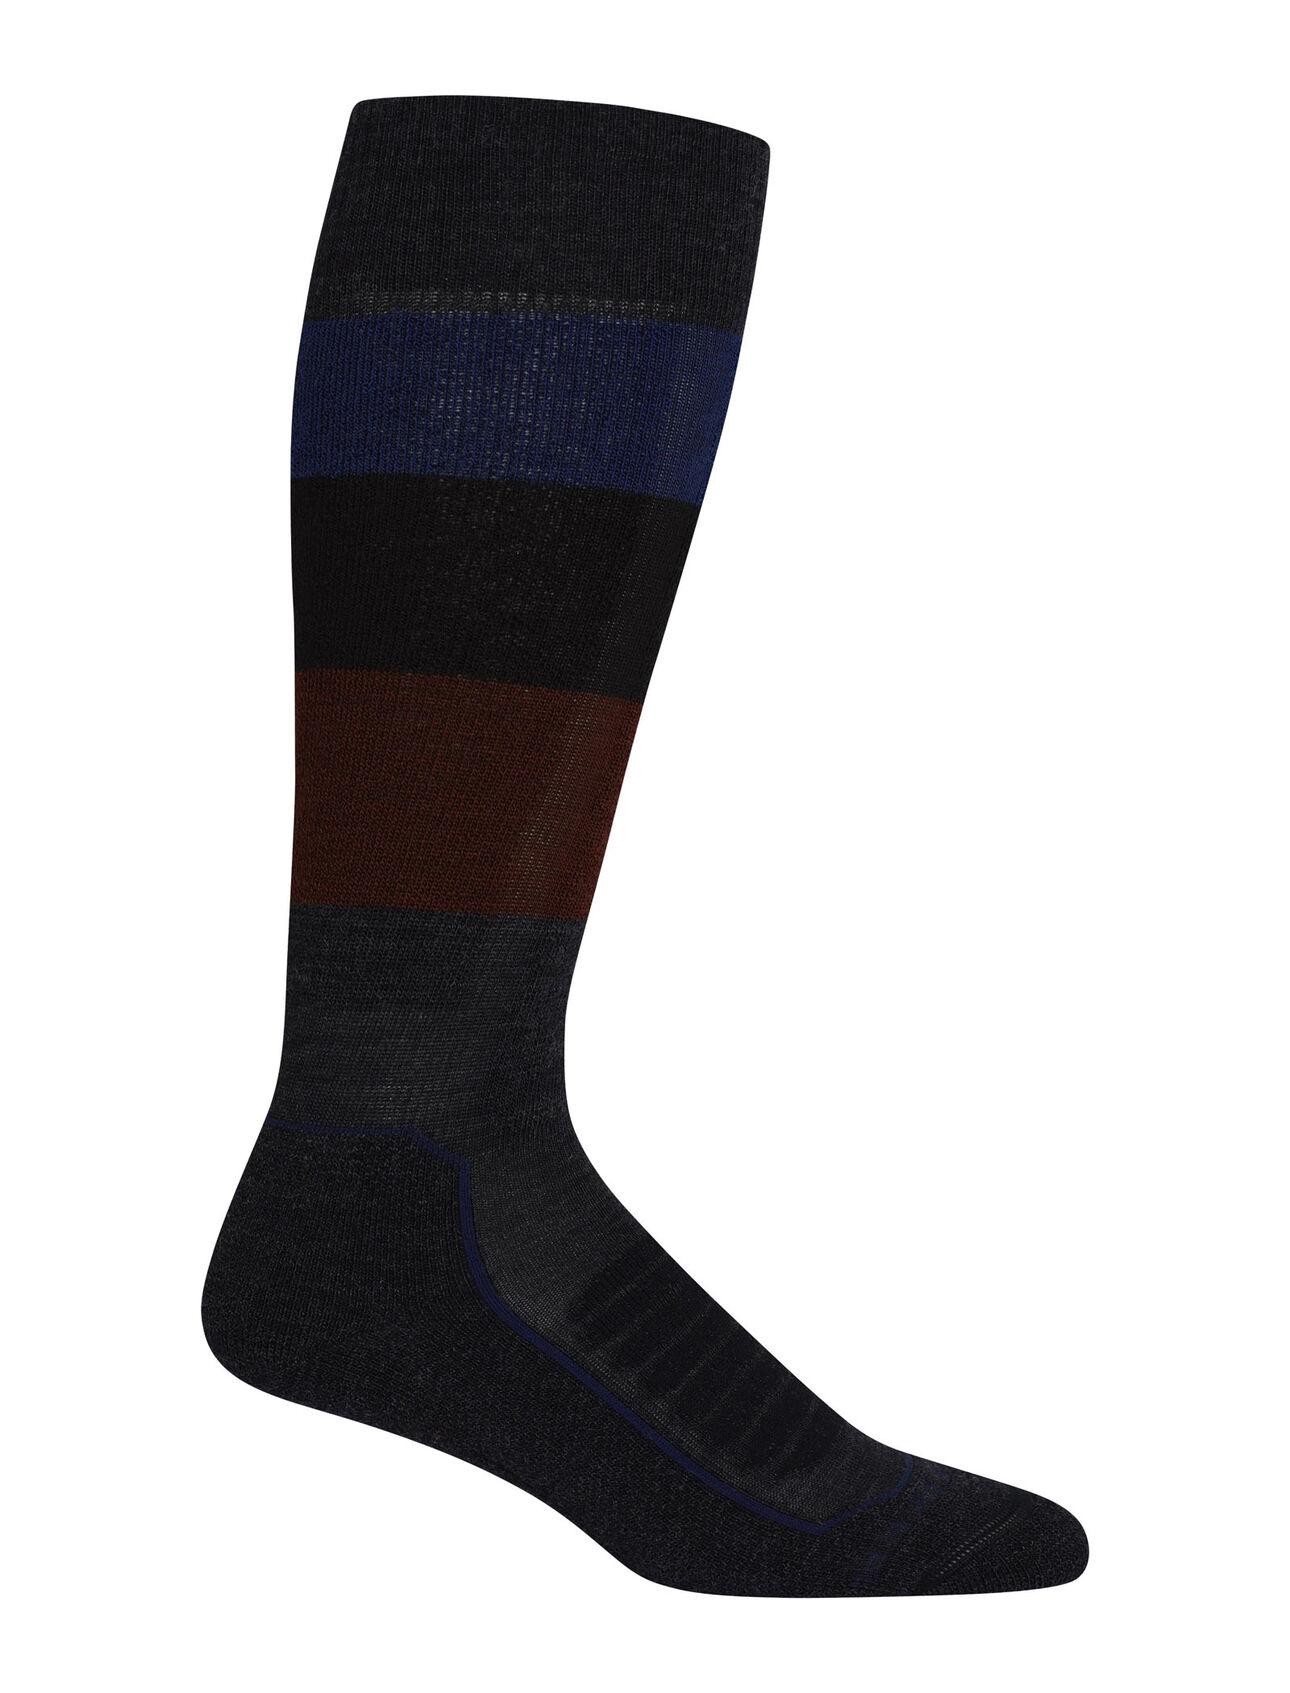 Merino Ski+ Medium Over the Calf Wide Stripe Socks